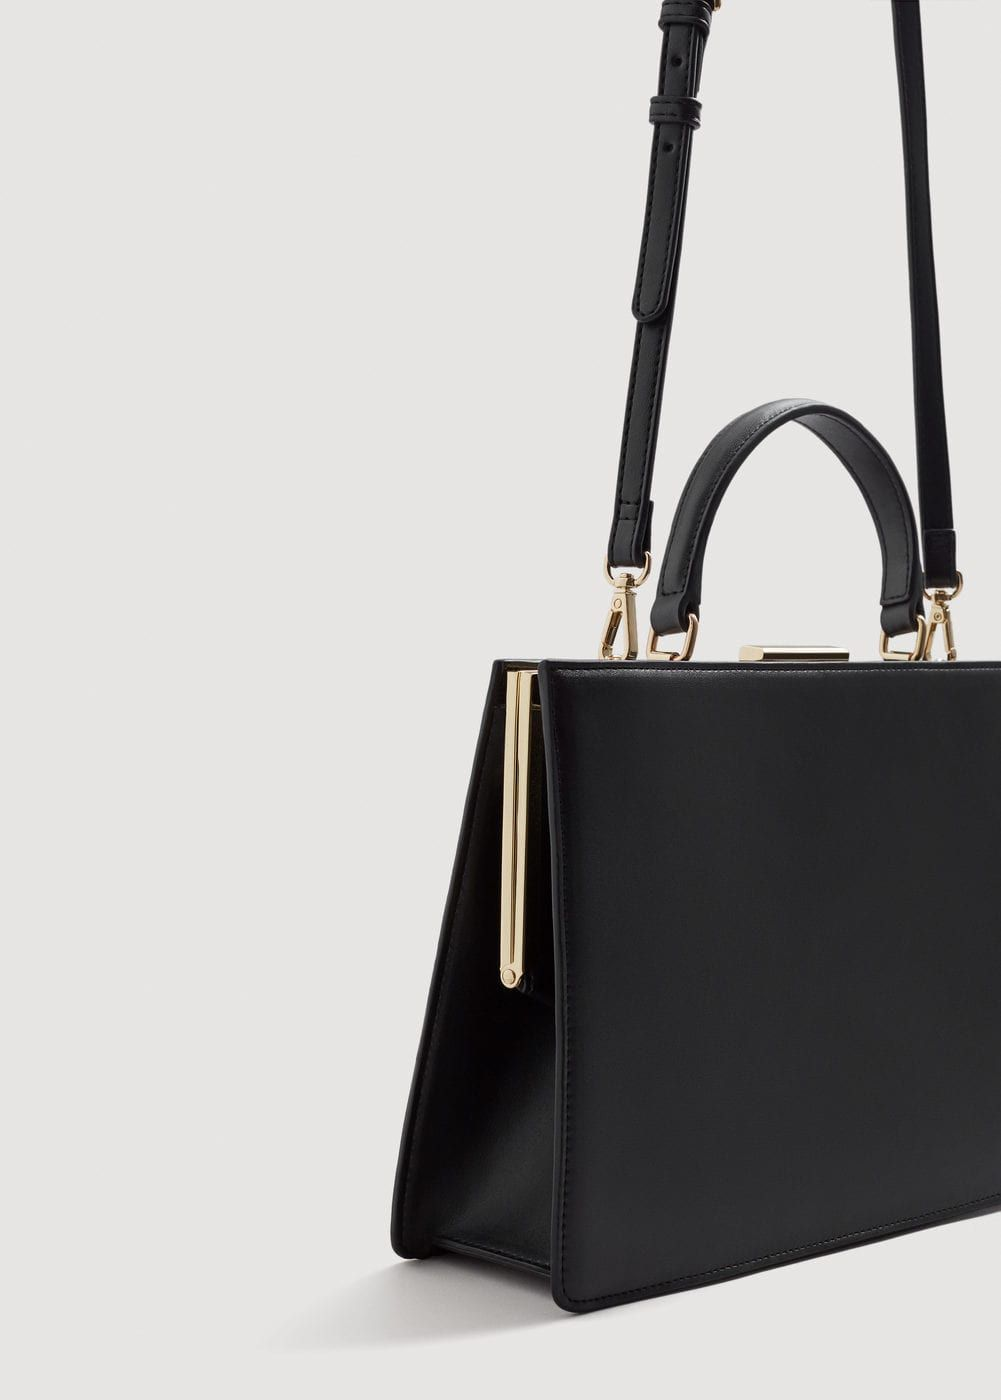 Bolso estilo maletín - Bolsos de Mujer  218a9eef858